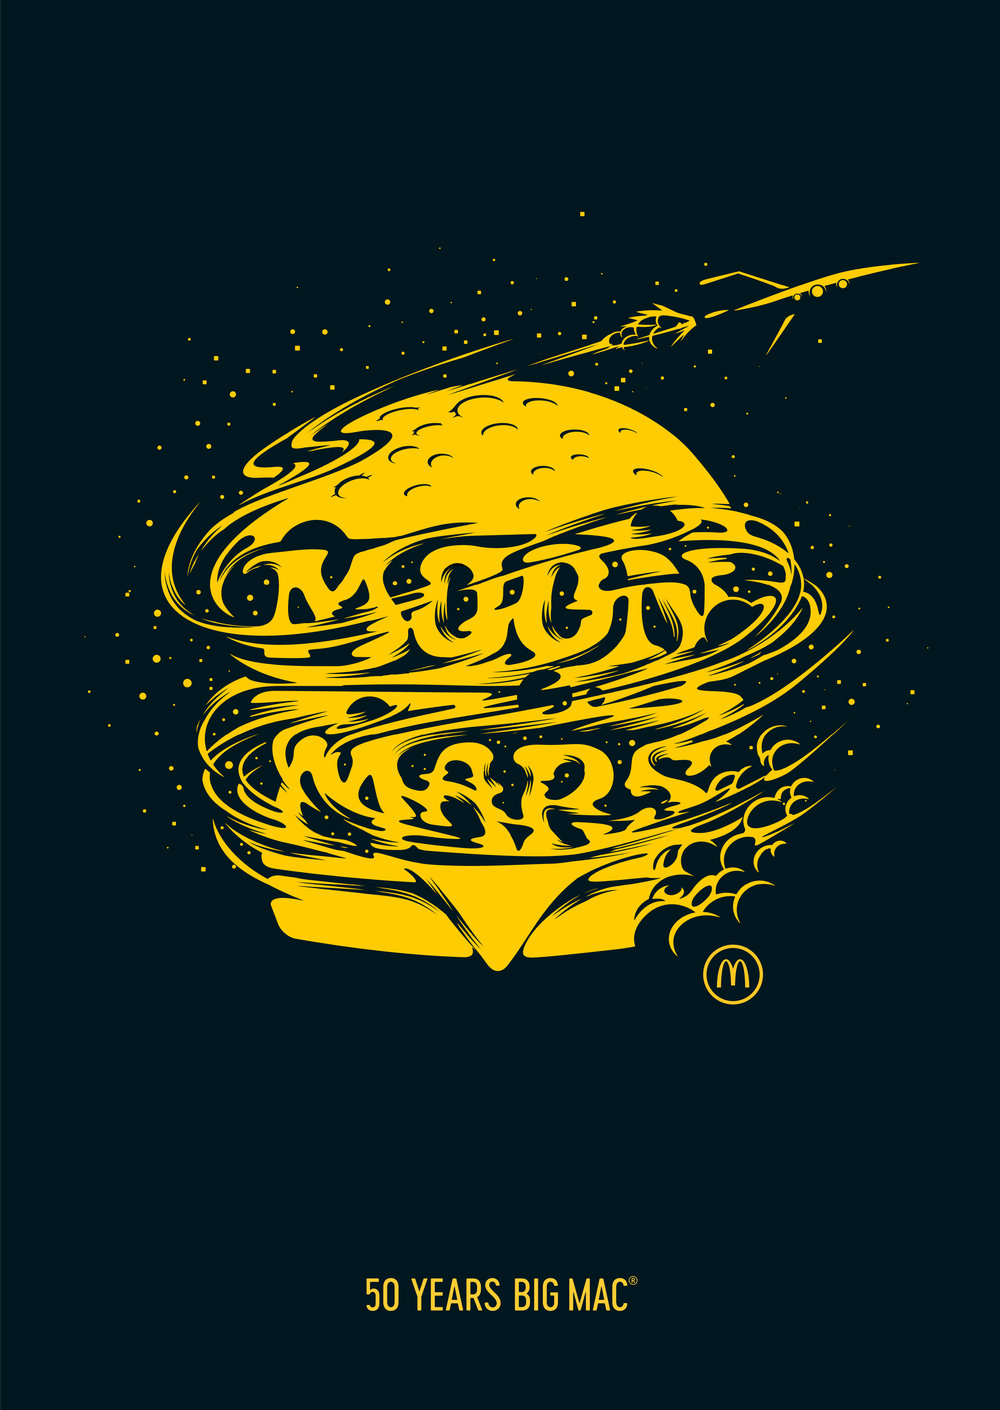 8_Moon:Mars.jpg